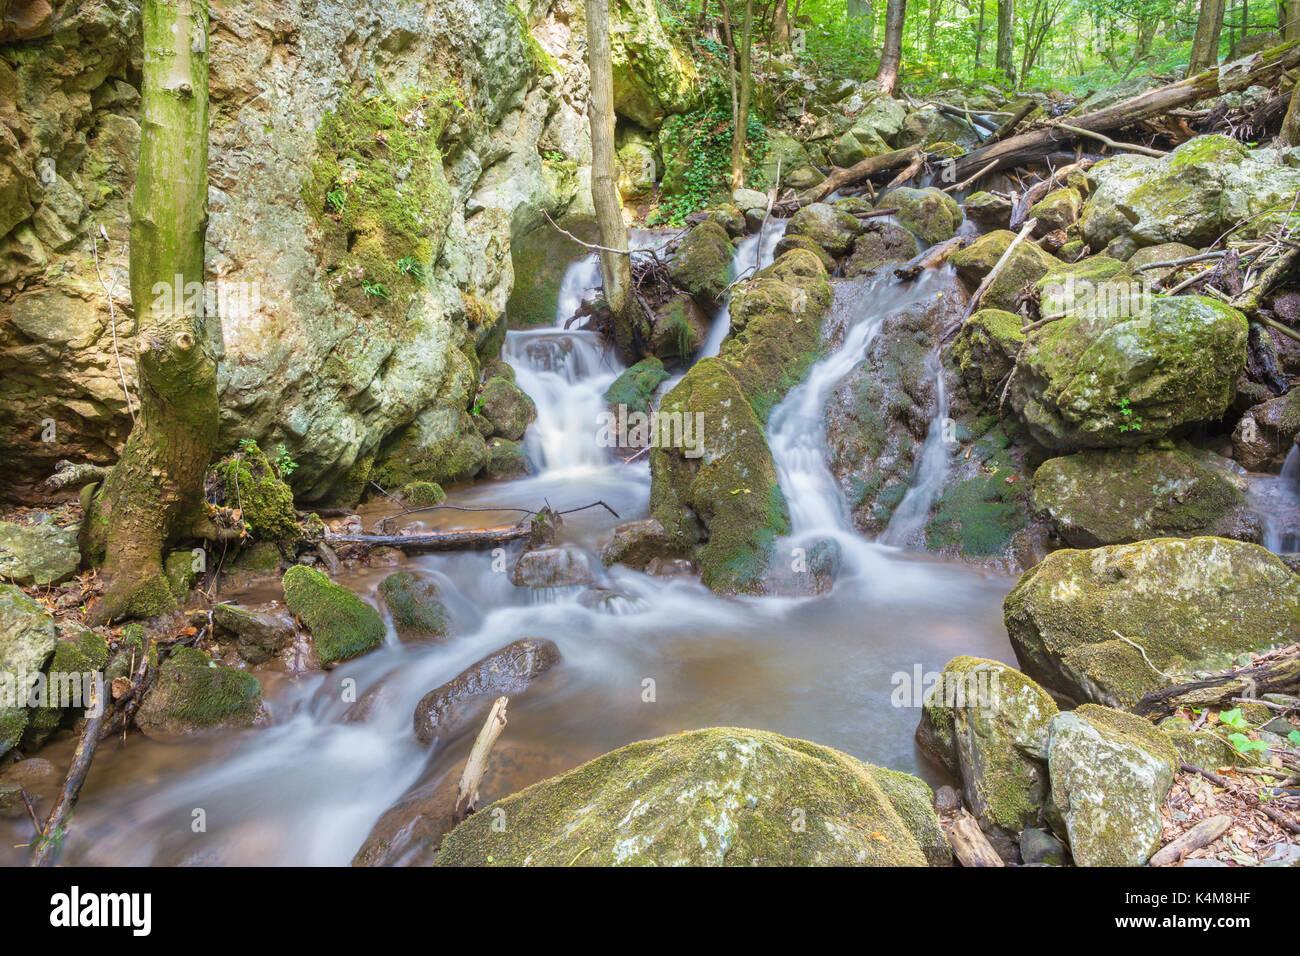 Slowakei - Der Wasserfall in Zadielska Tal im Nationalpark Slovensky Kras. Stockbild